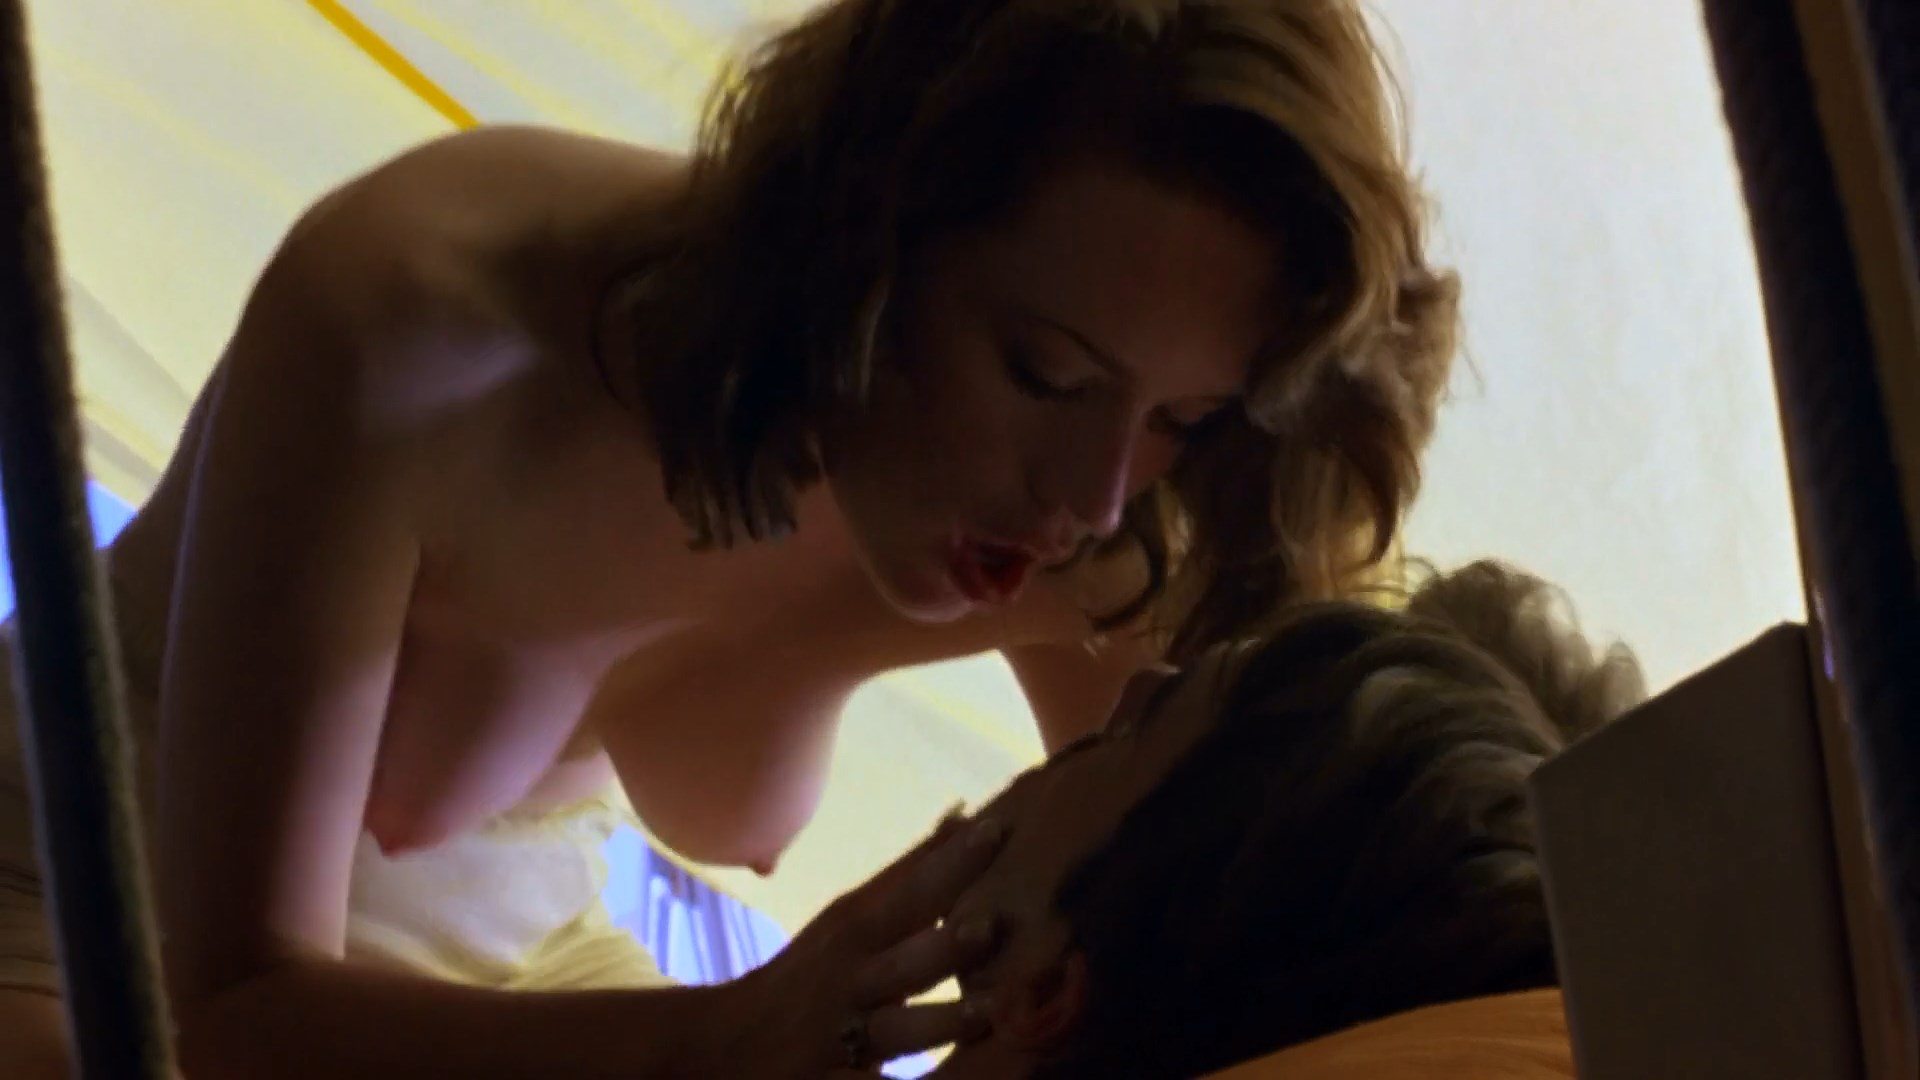 Molly ringwald nude